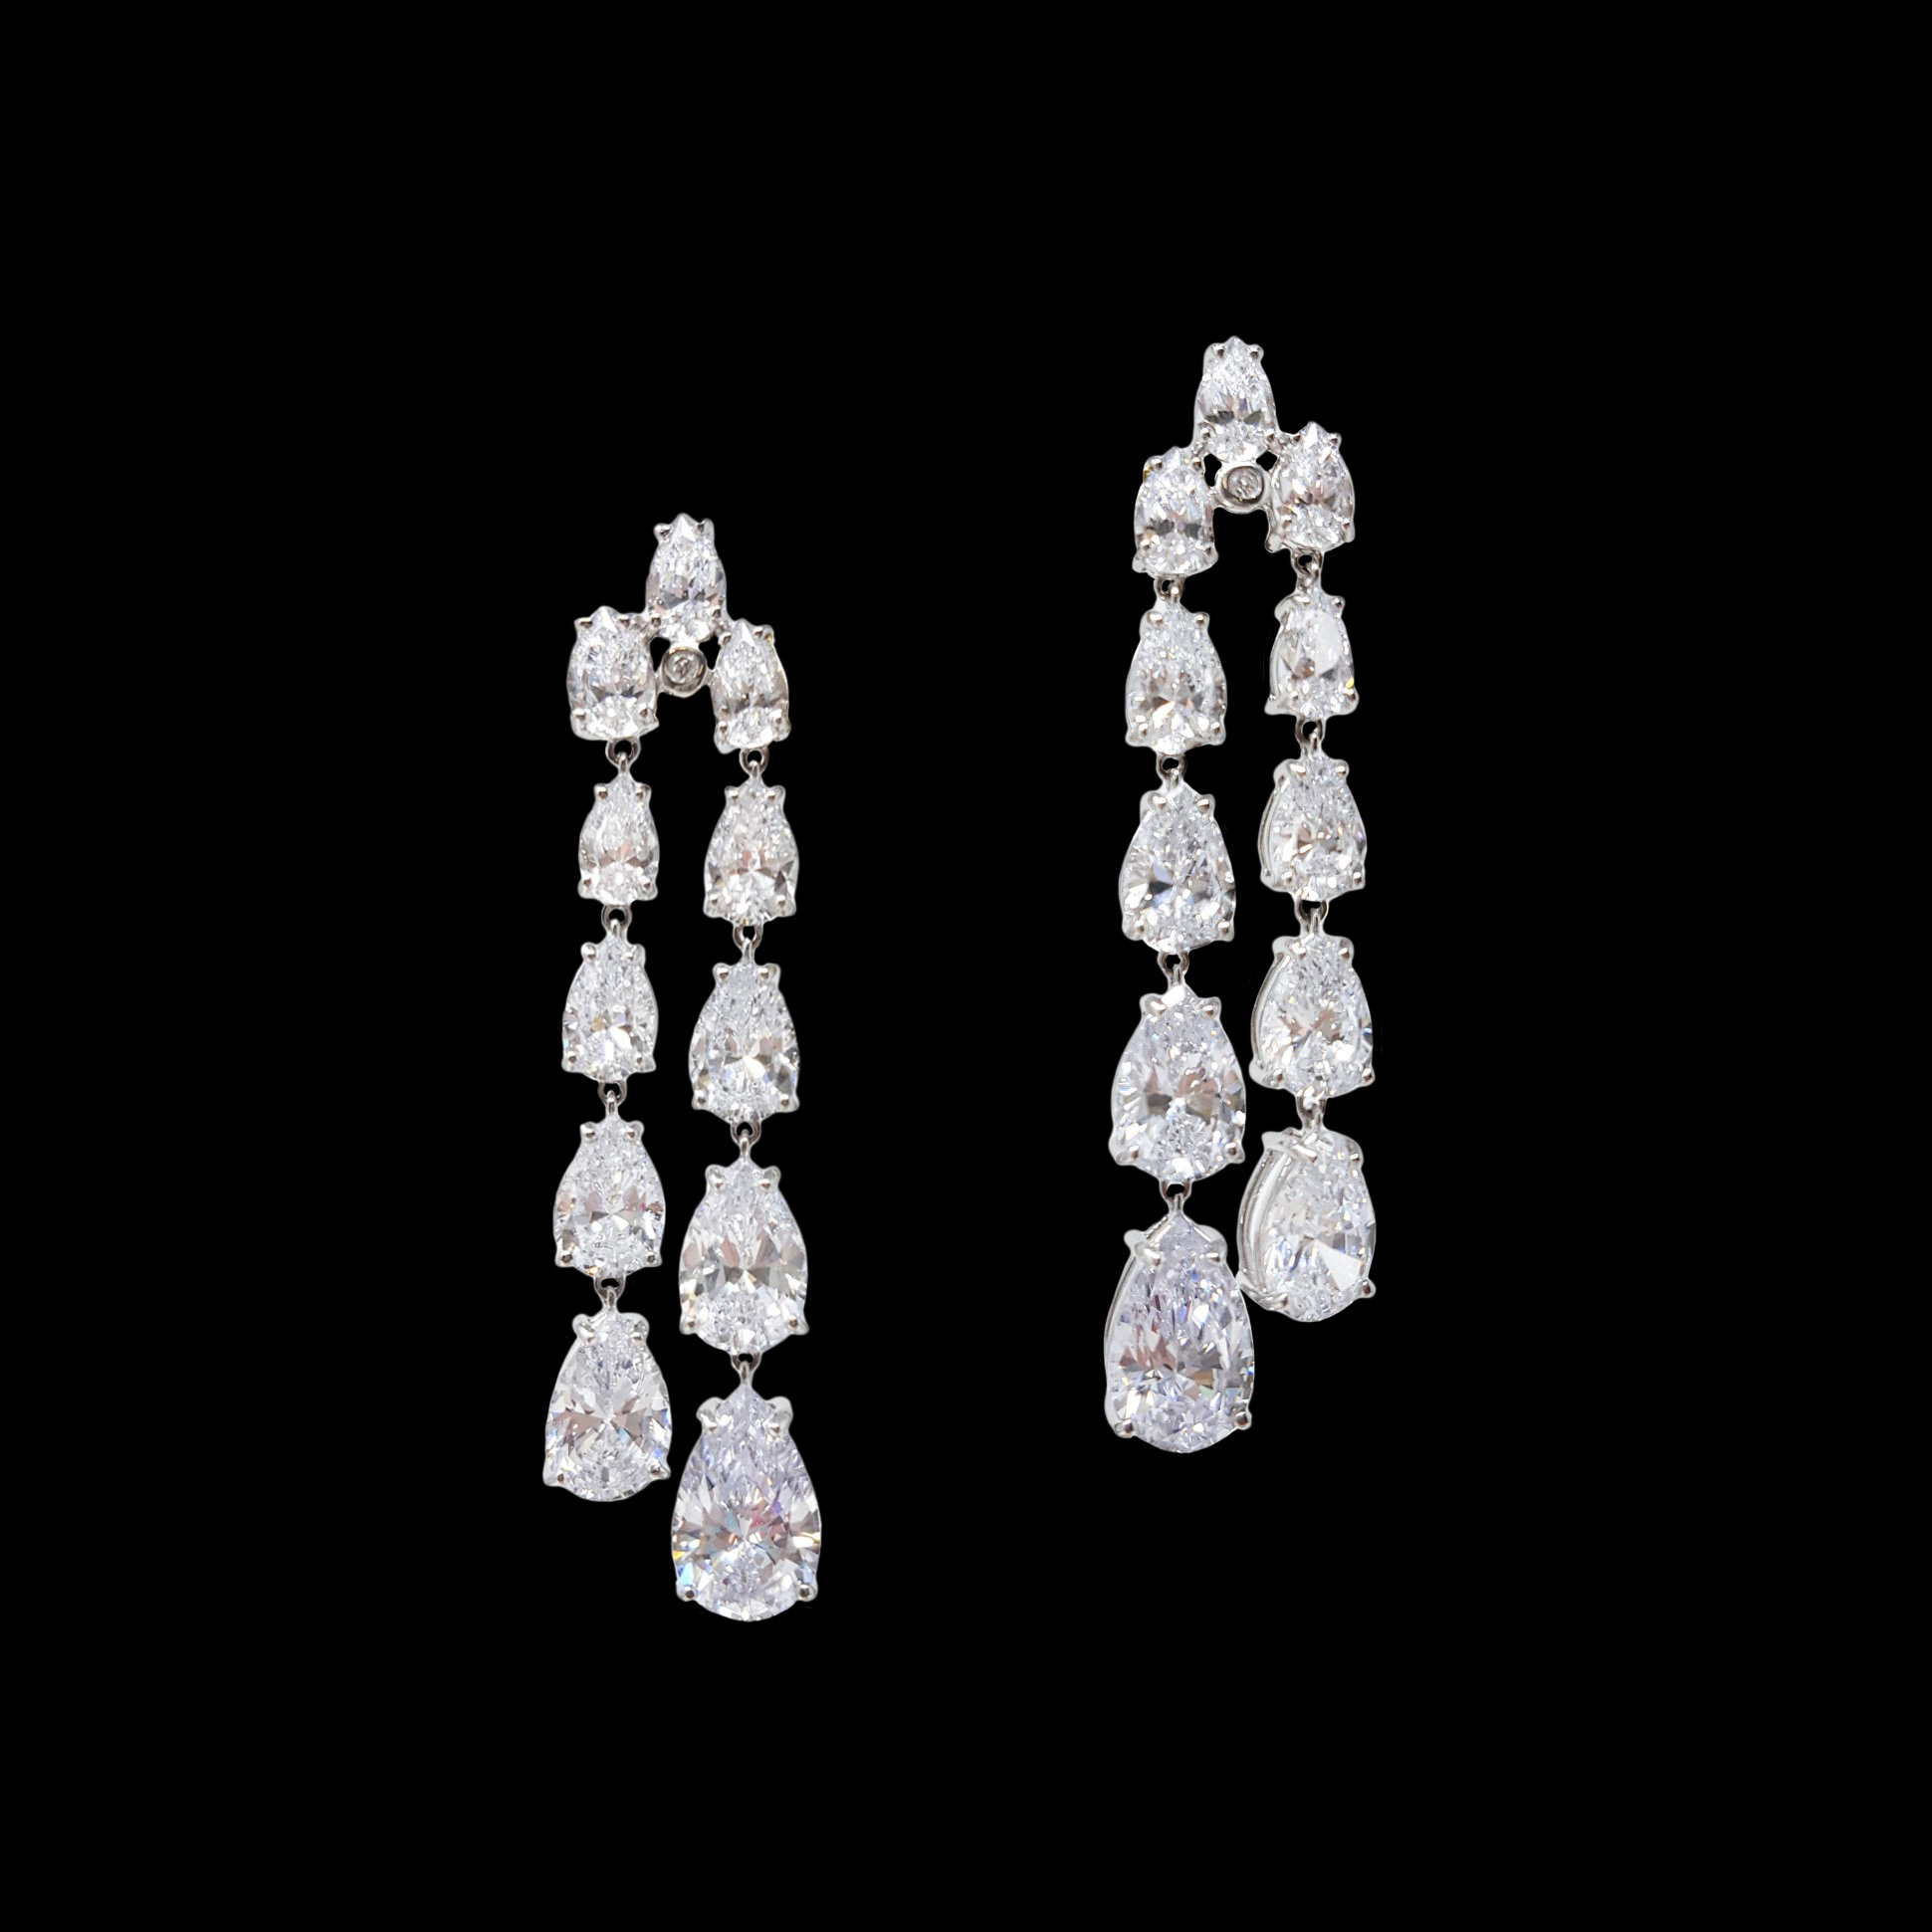 Nuvole Bianche earring worn by Demi Lovato